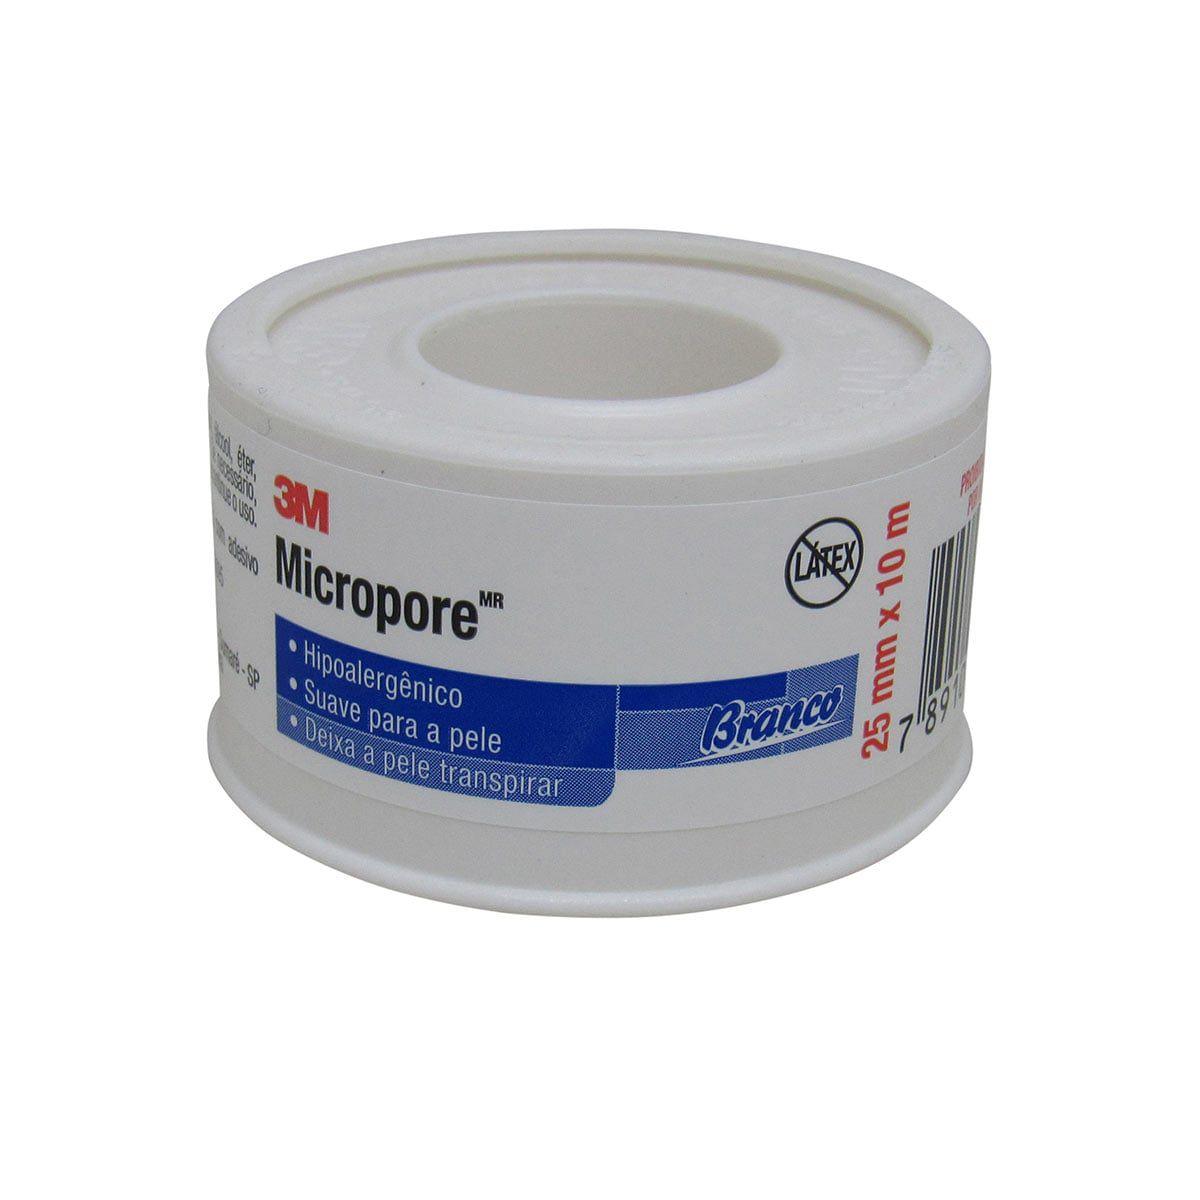 Fita Micropore 25mm x 10m Hipoalergênica Branca 3M Kit com 20un